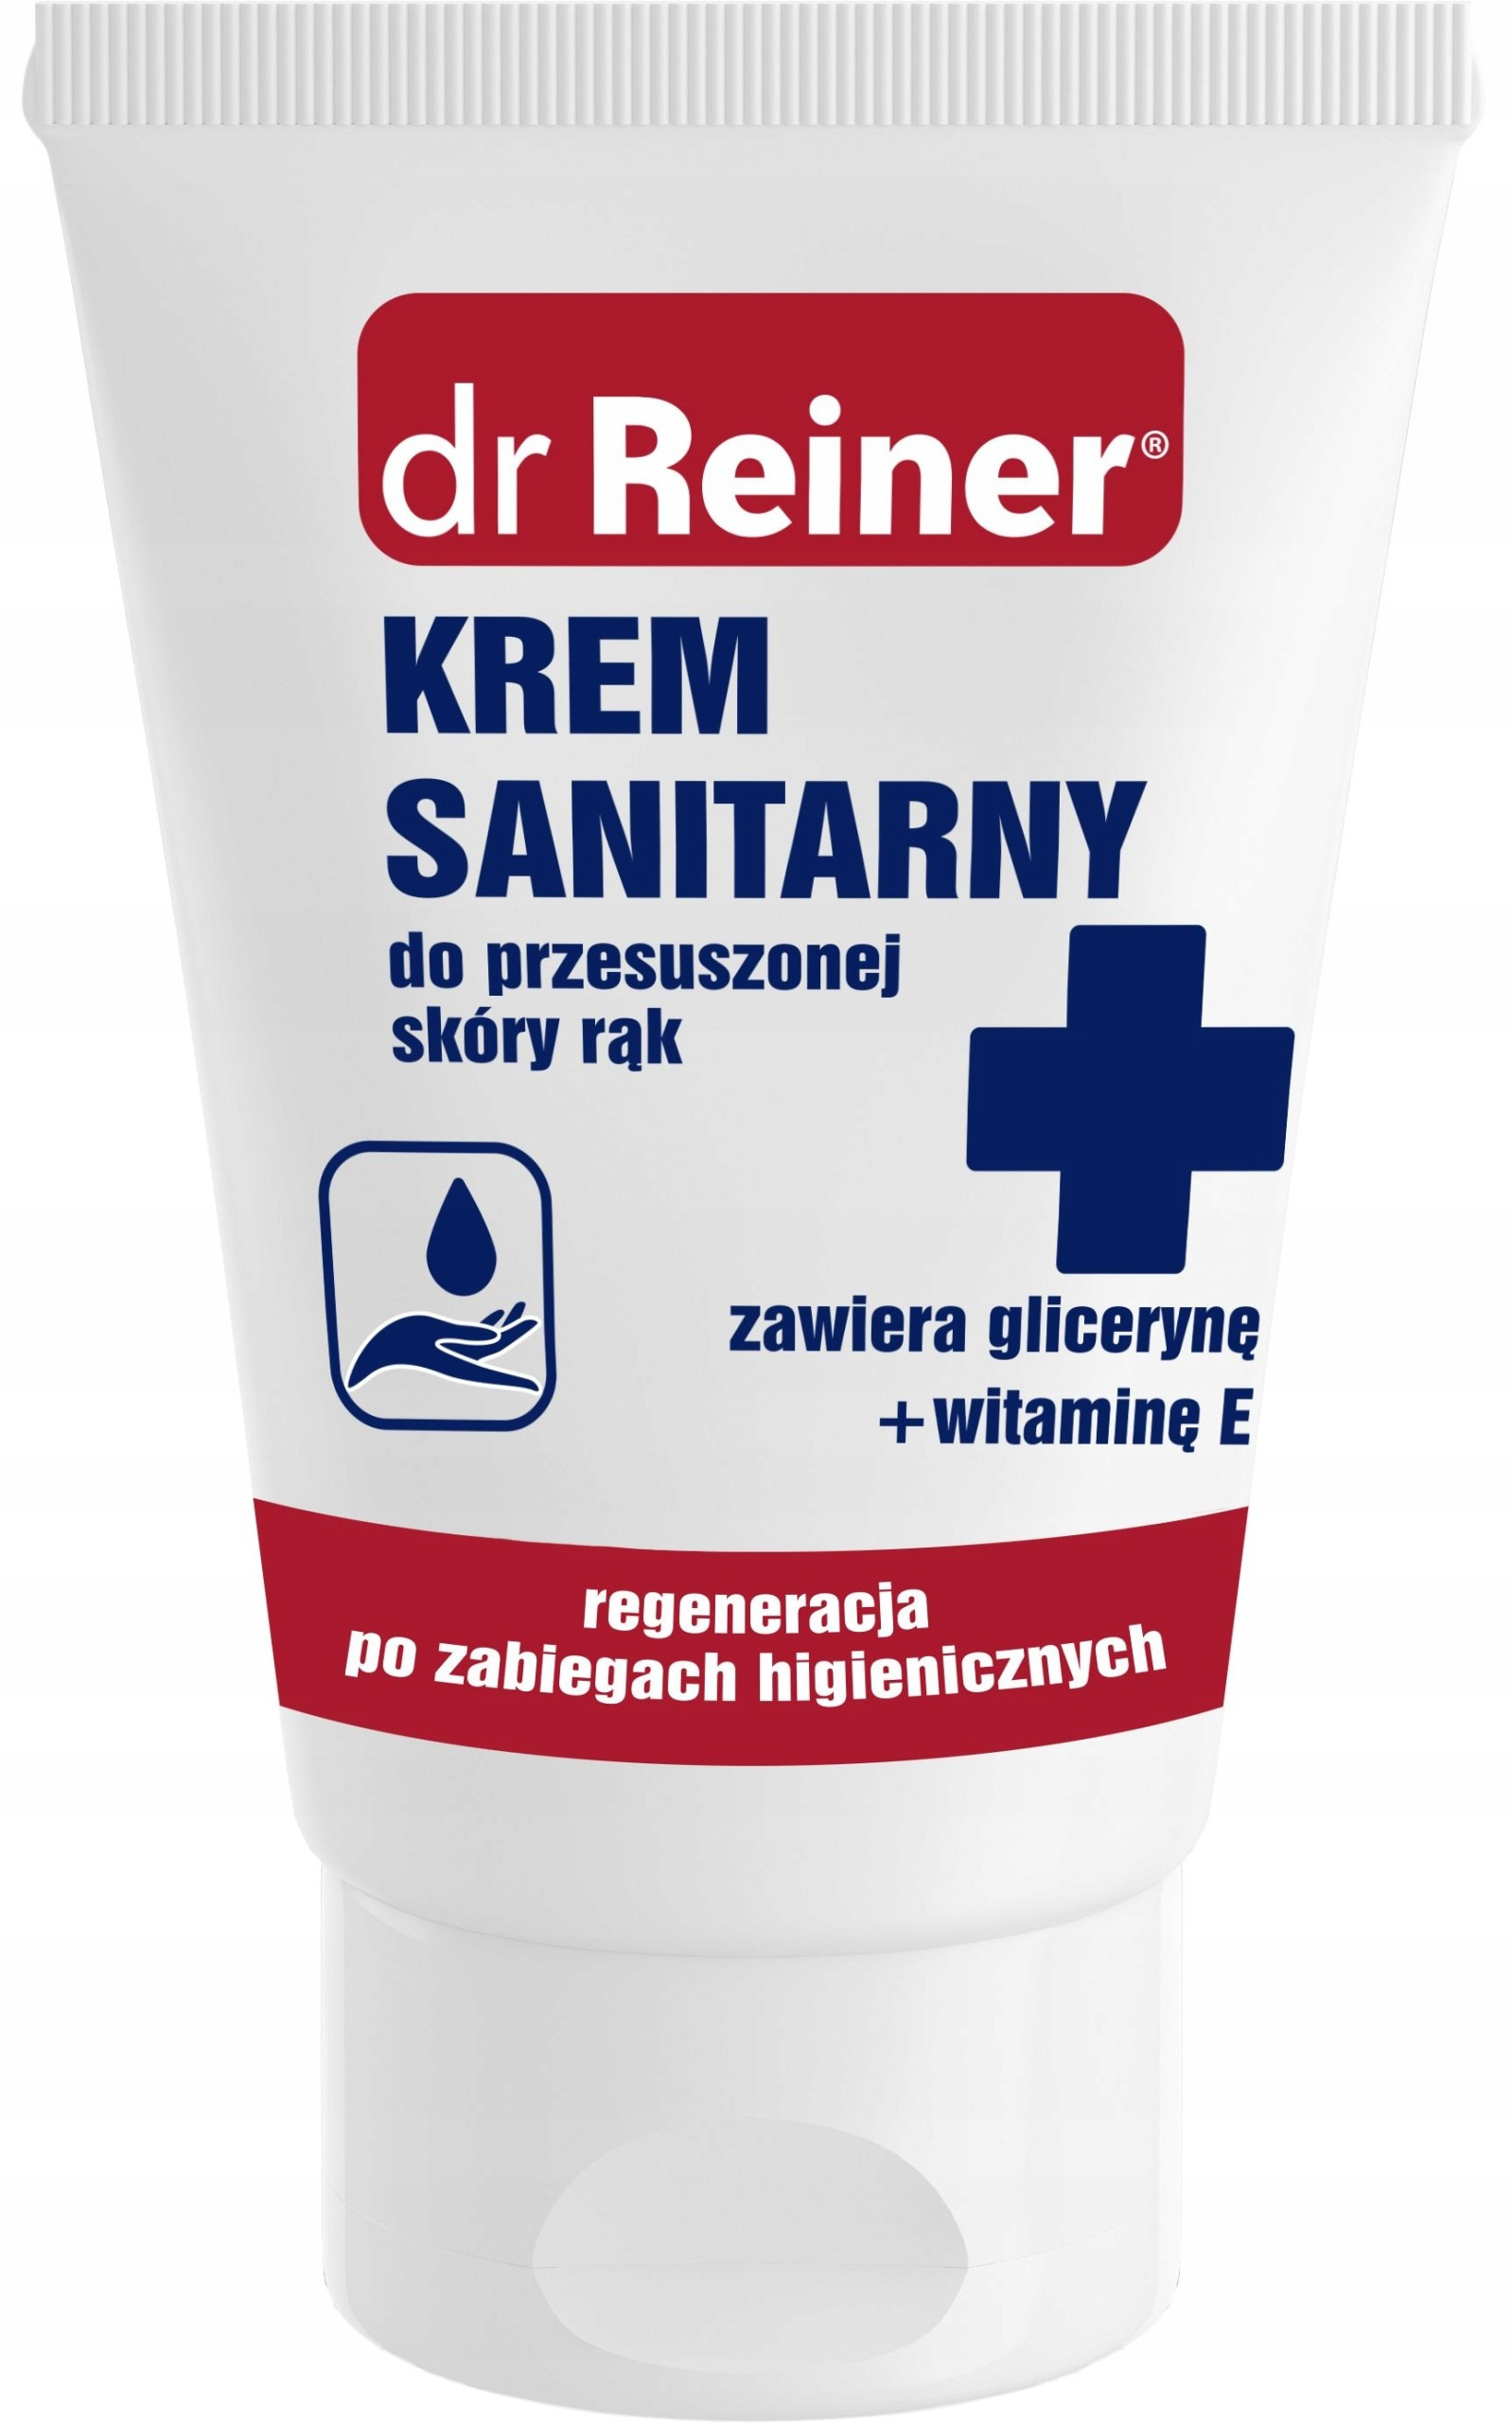 Dr Reiner Krem sanitarny do przesuszonej skóry rąk